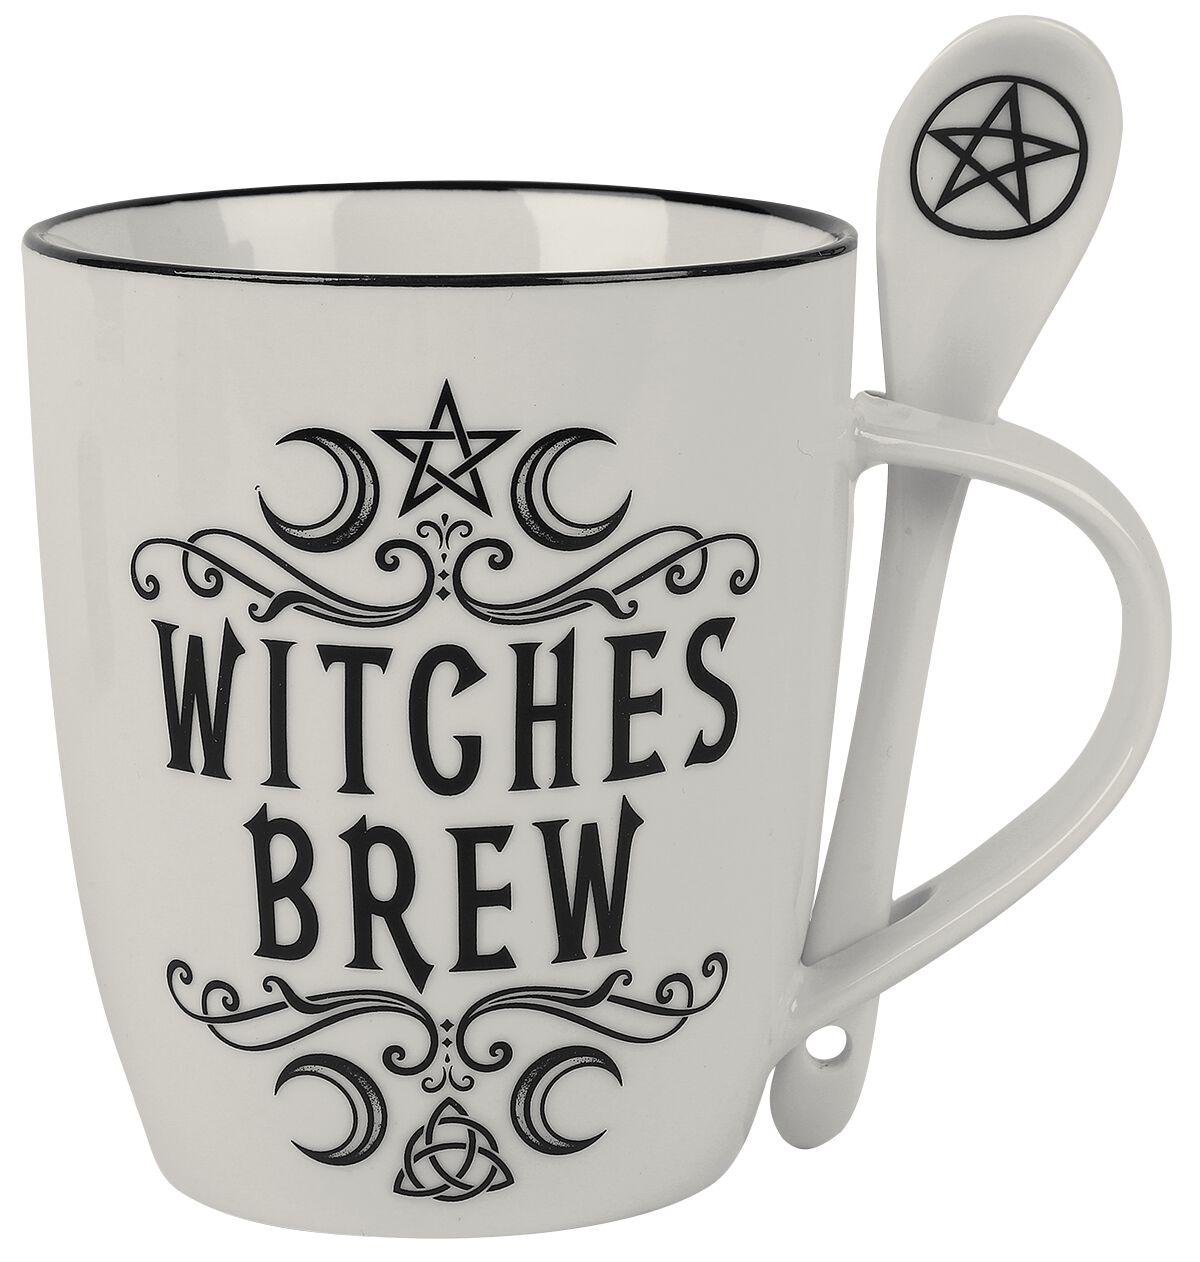 Alchemy England 1977 Witches Brew Tasse weiß schwarz ALMUG16